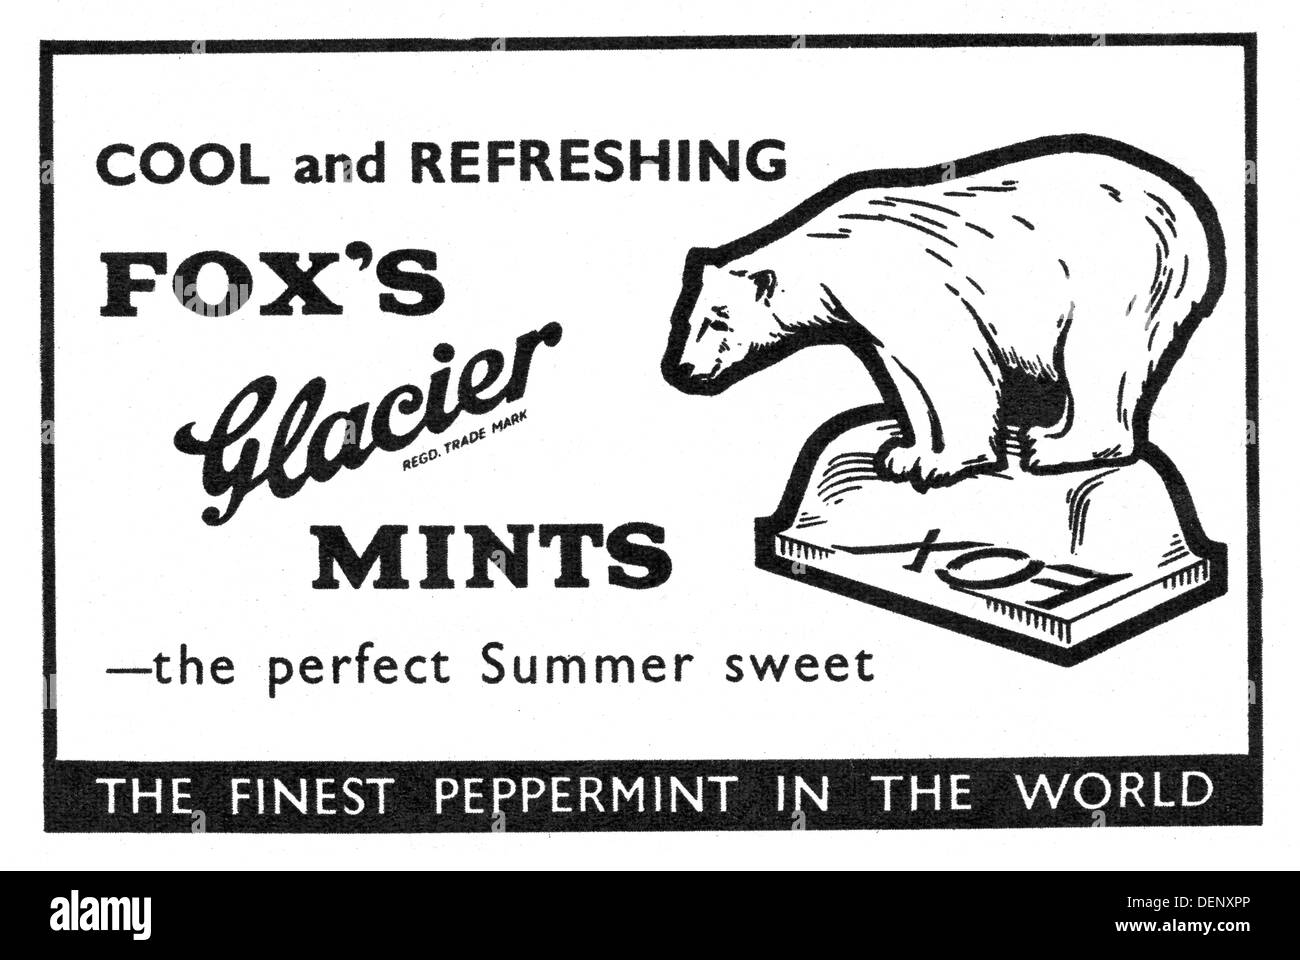 1957 advert for Fox's Glacier Mints - Stock Image